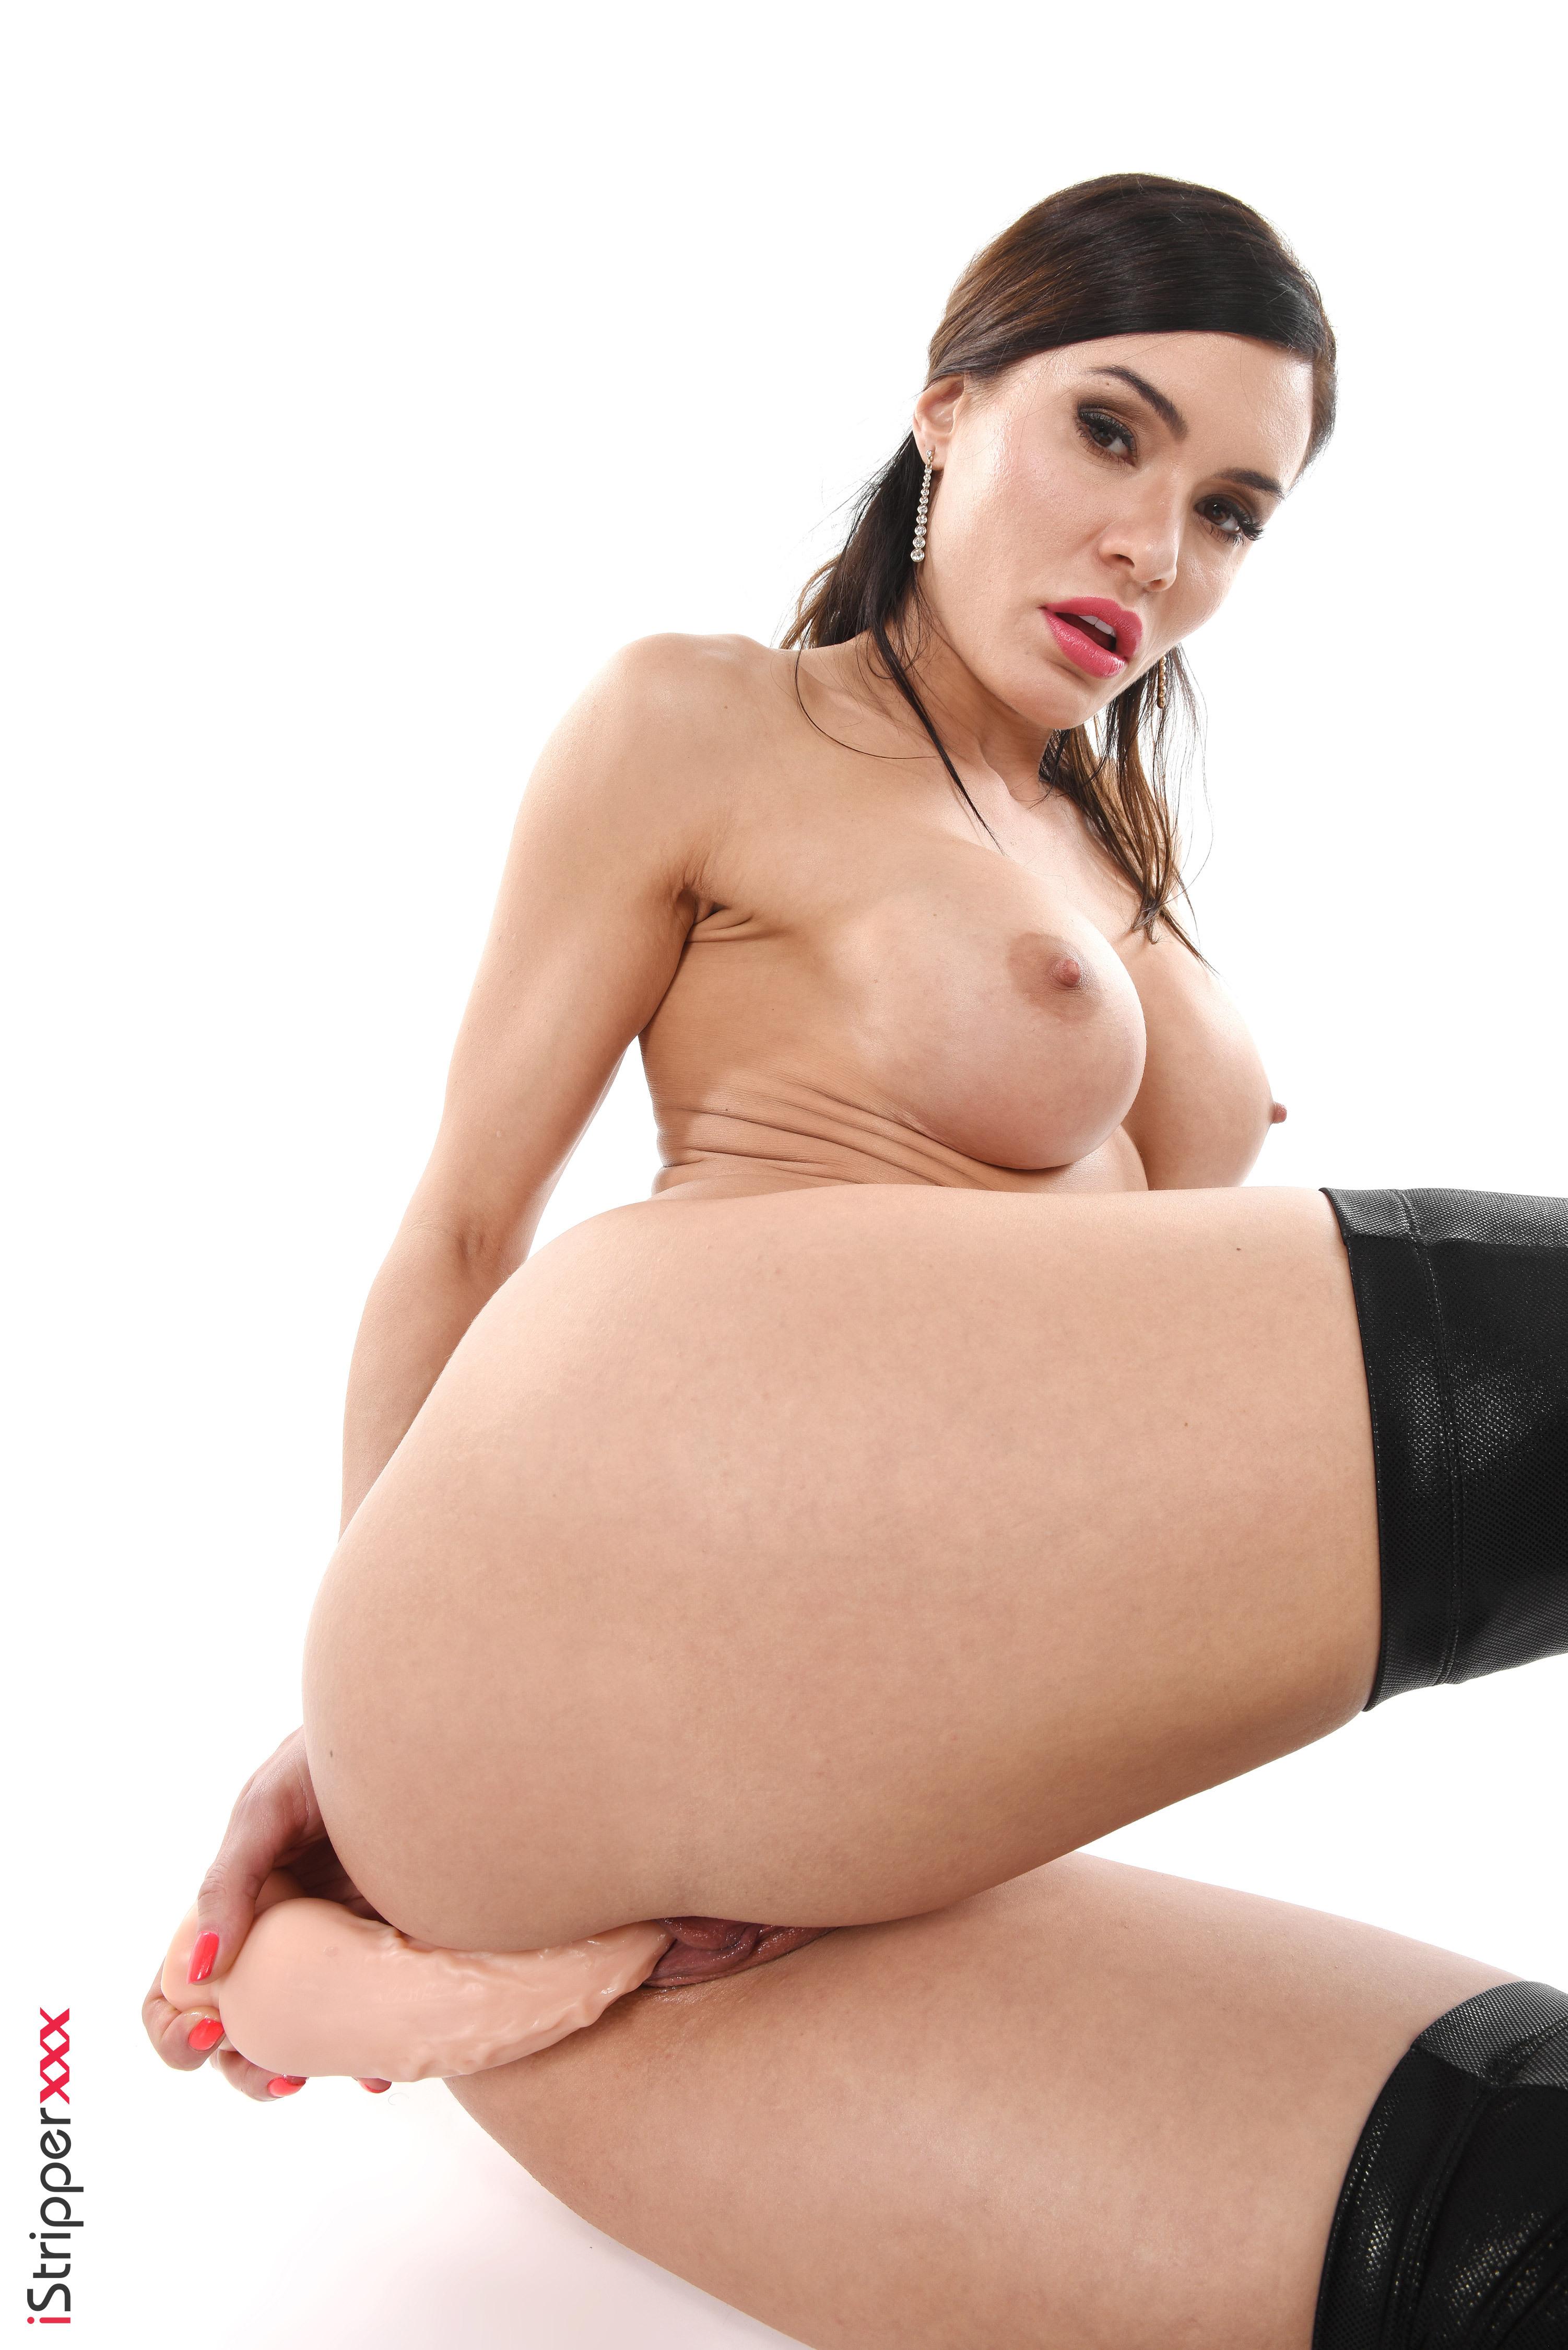 nude girls full hd wallpapers